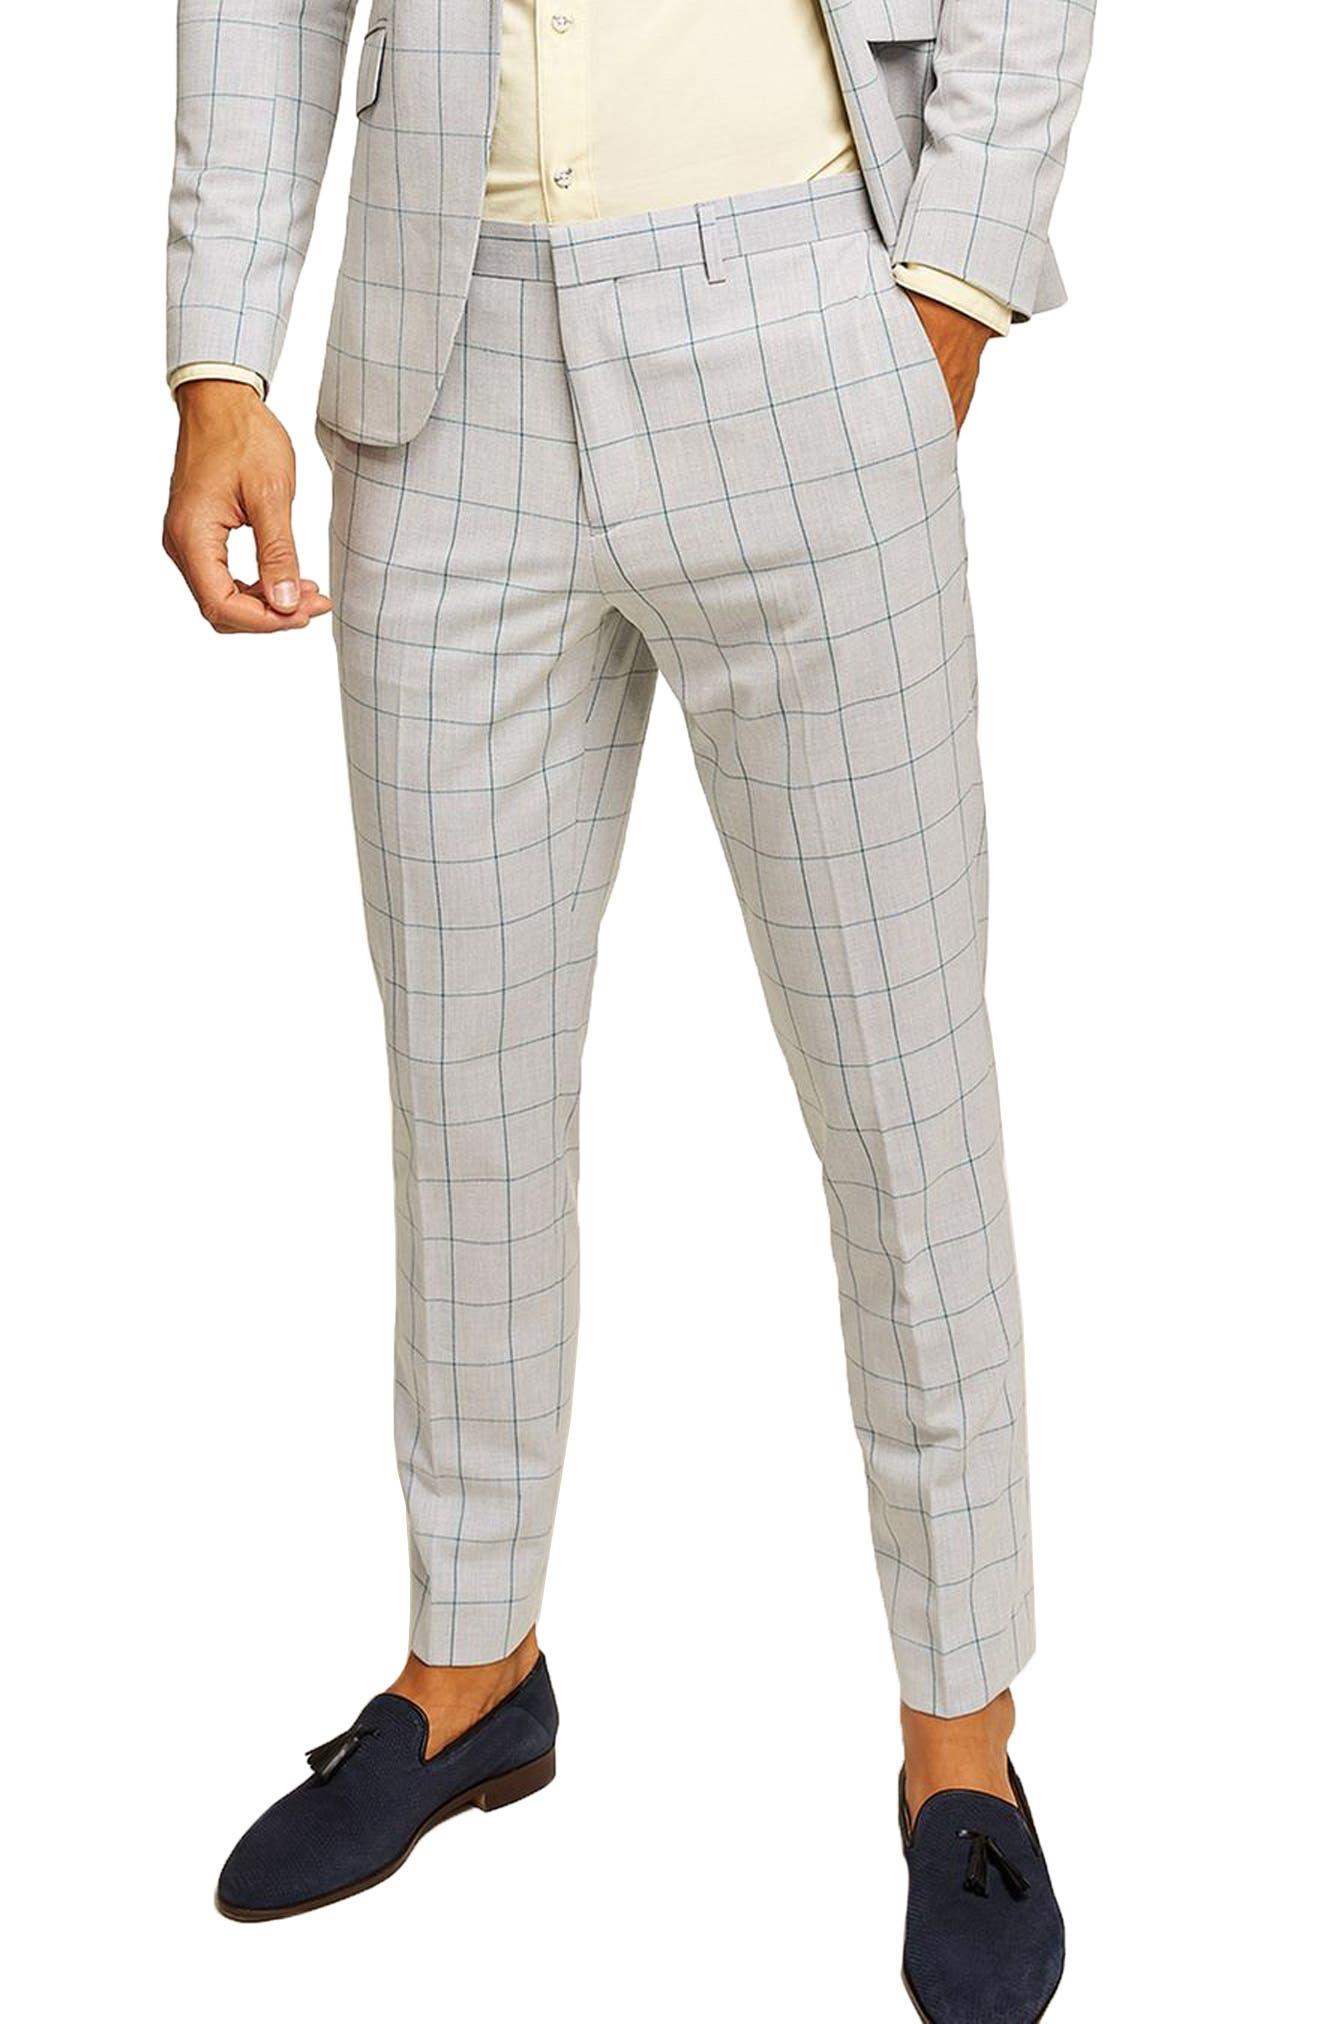 TOPMAN Muscle Fit Check Suit Trousers, Main, color, 300